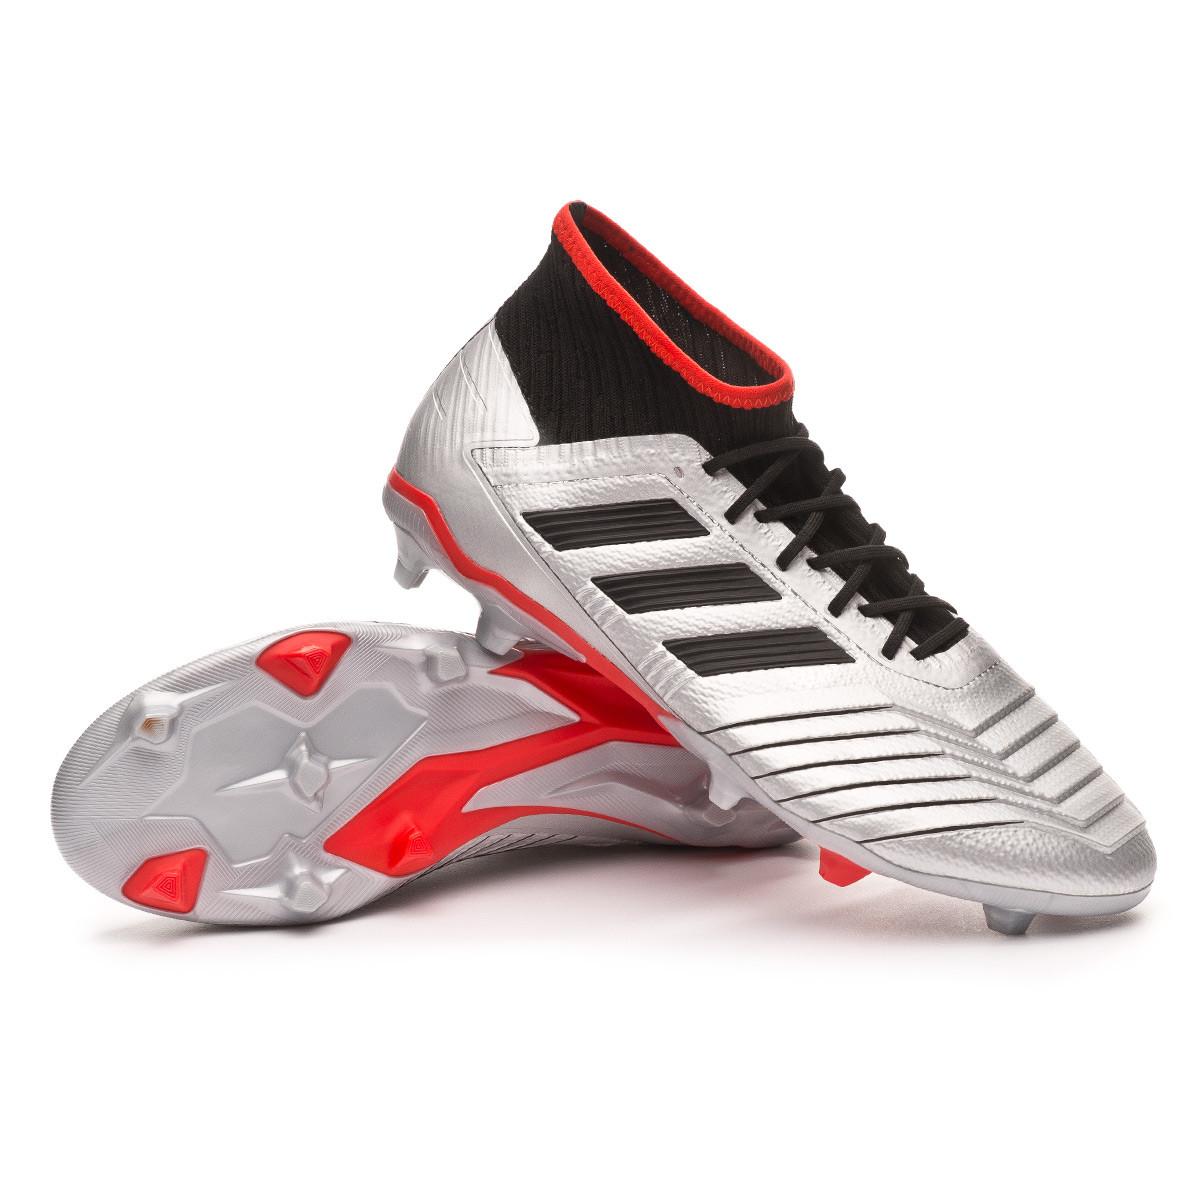 df5acfa43 Football Boots adidas Predator 19.2 FG Silver metallic-Core black-Hi red -  Football store Fútbol Emotion